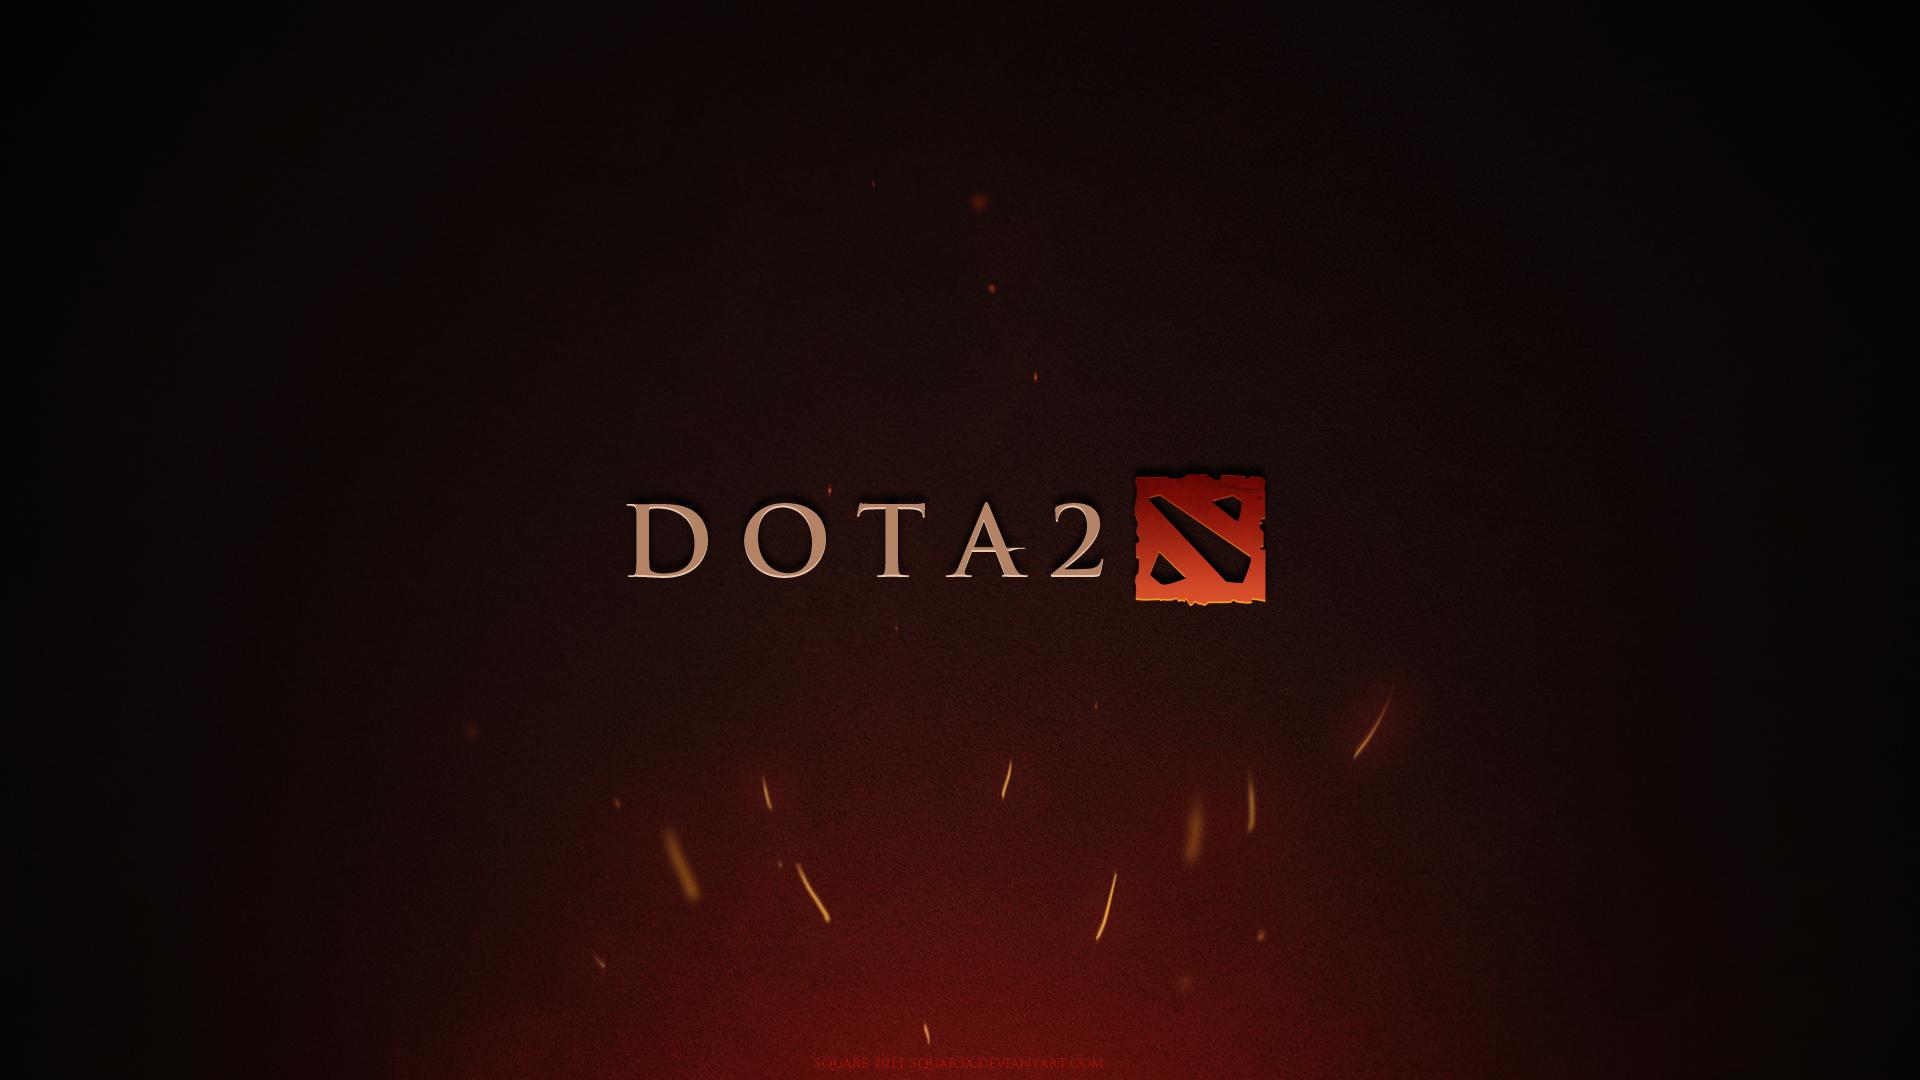 Steam Valve DotA 2 Logo   Dota 2 Wallpaper 1920x1080